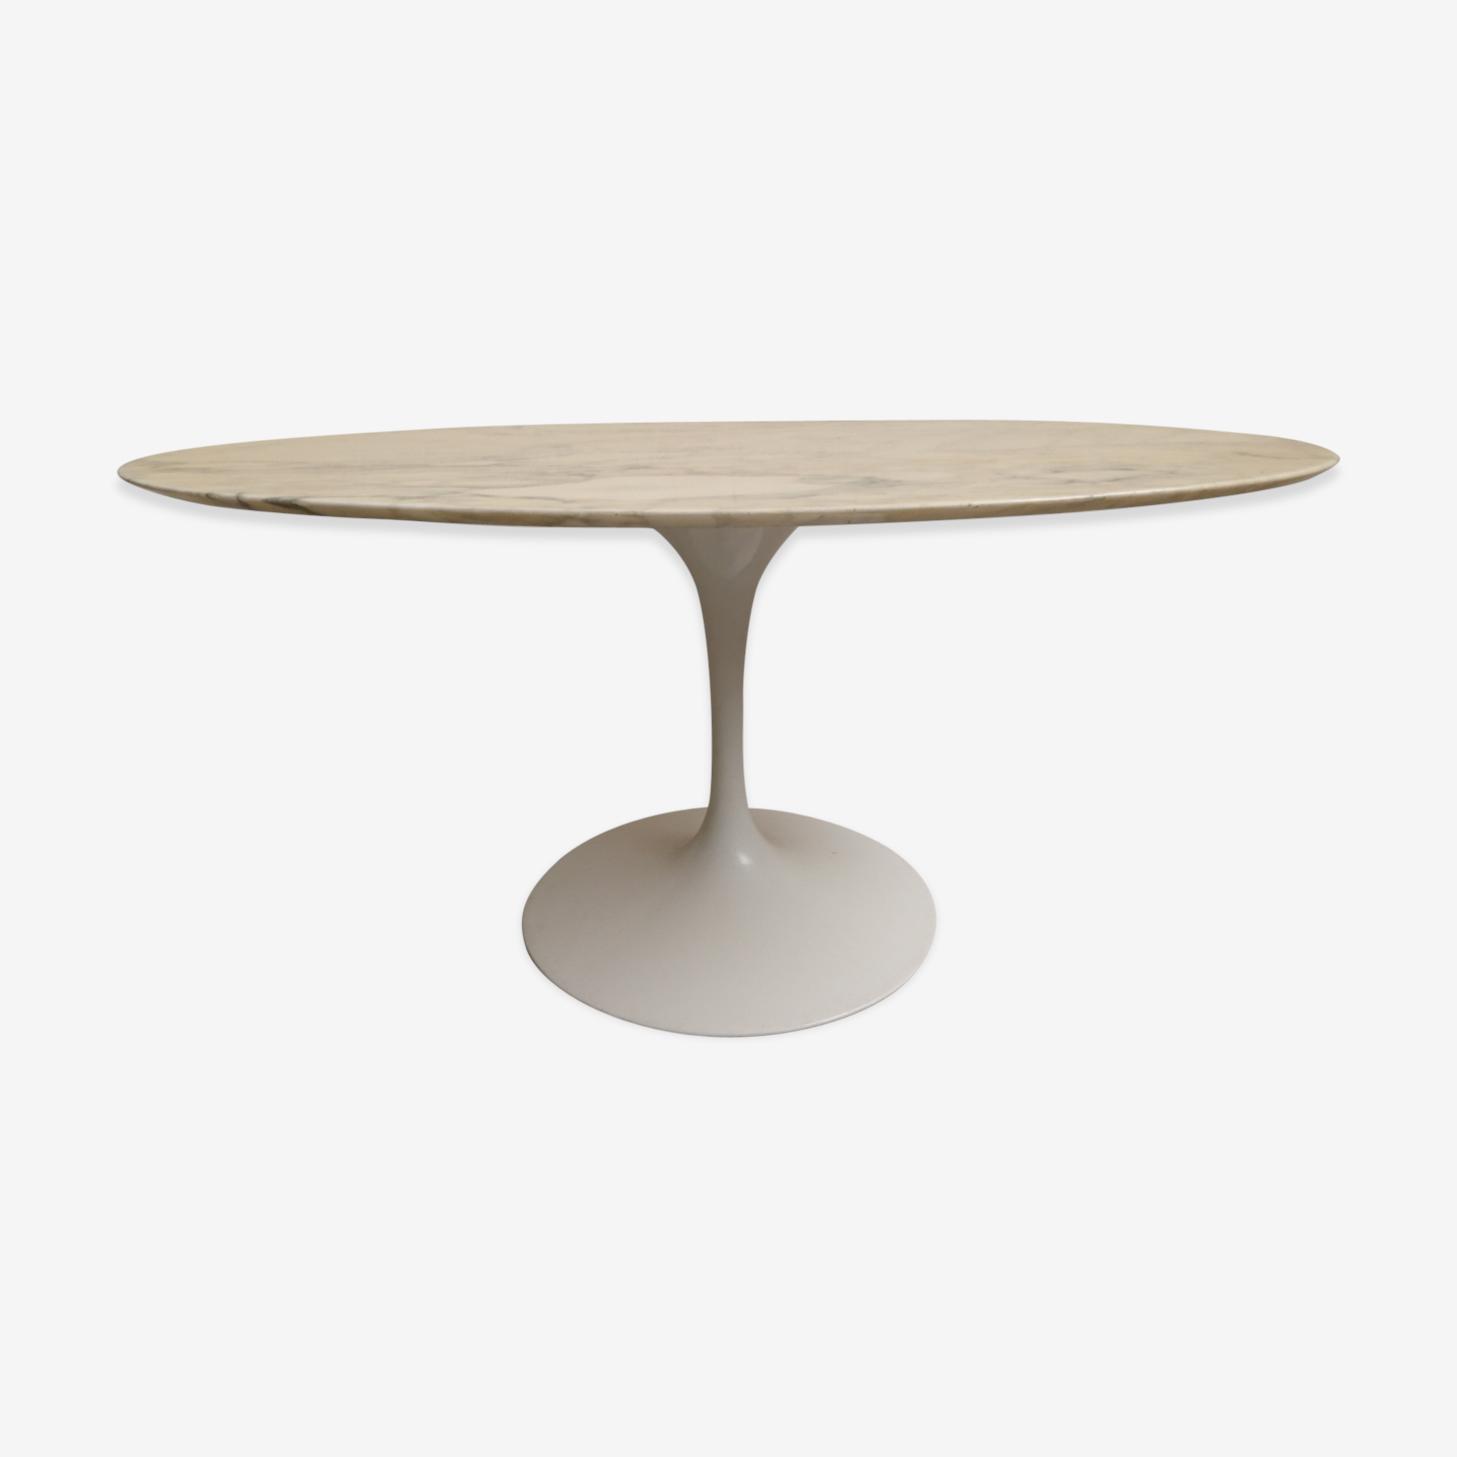 Table marble Knoll